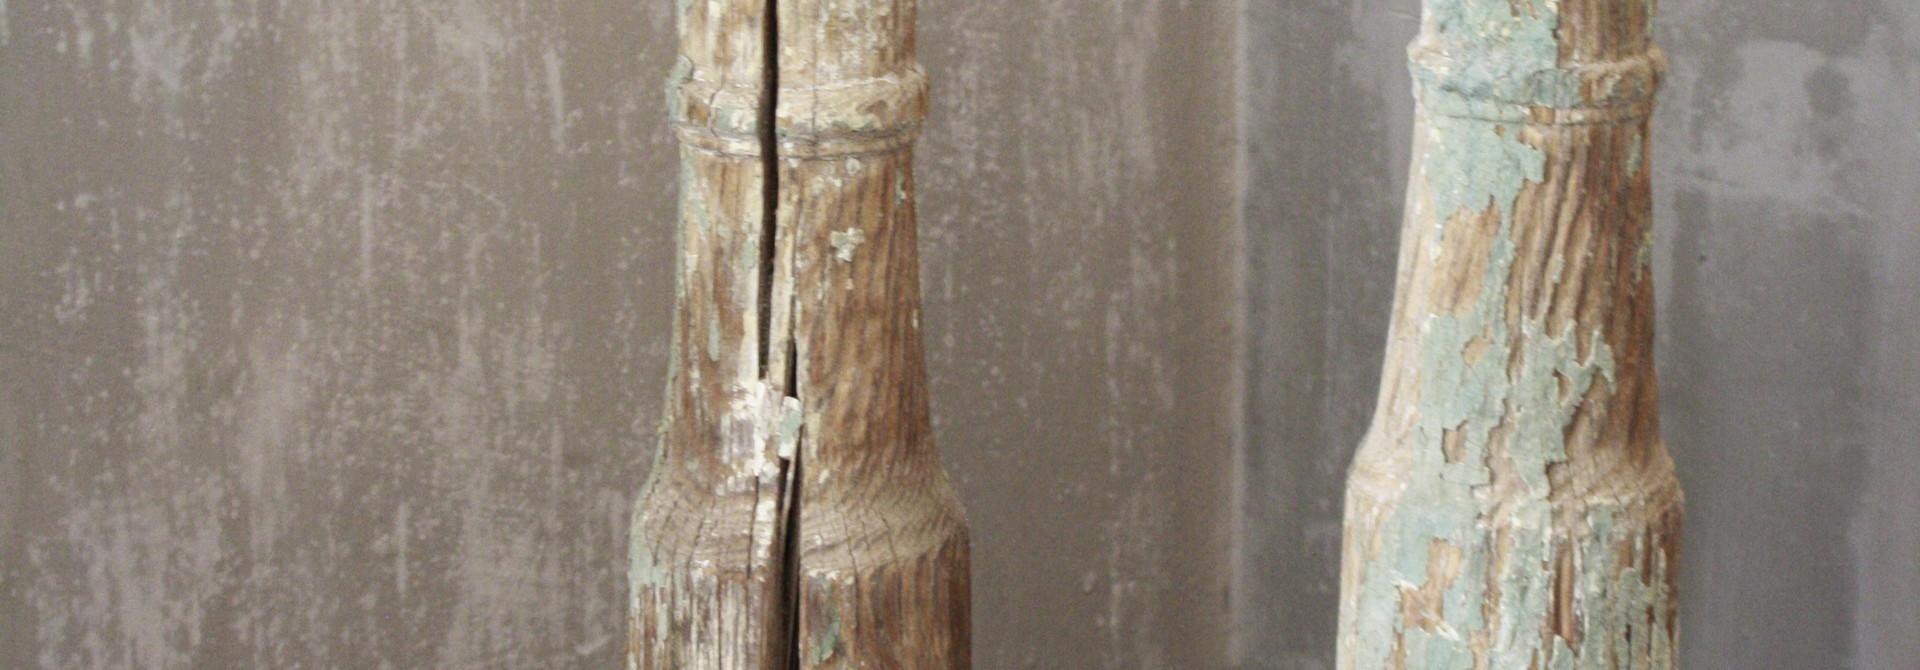 SET 2x Balusterlamp Oud Hout Groen tint 60 cm